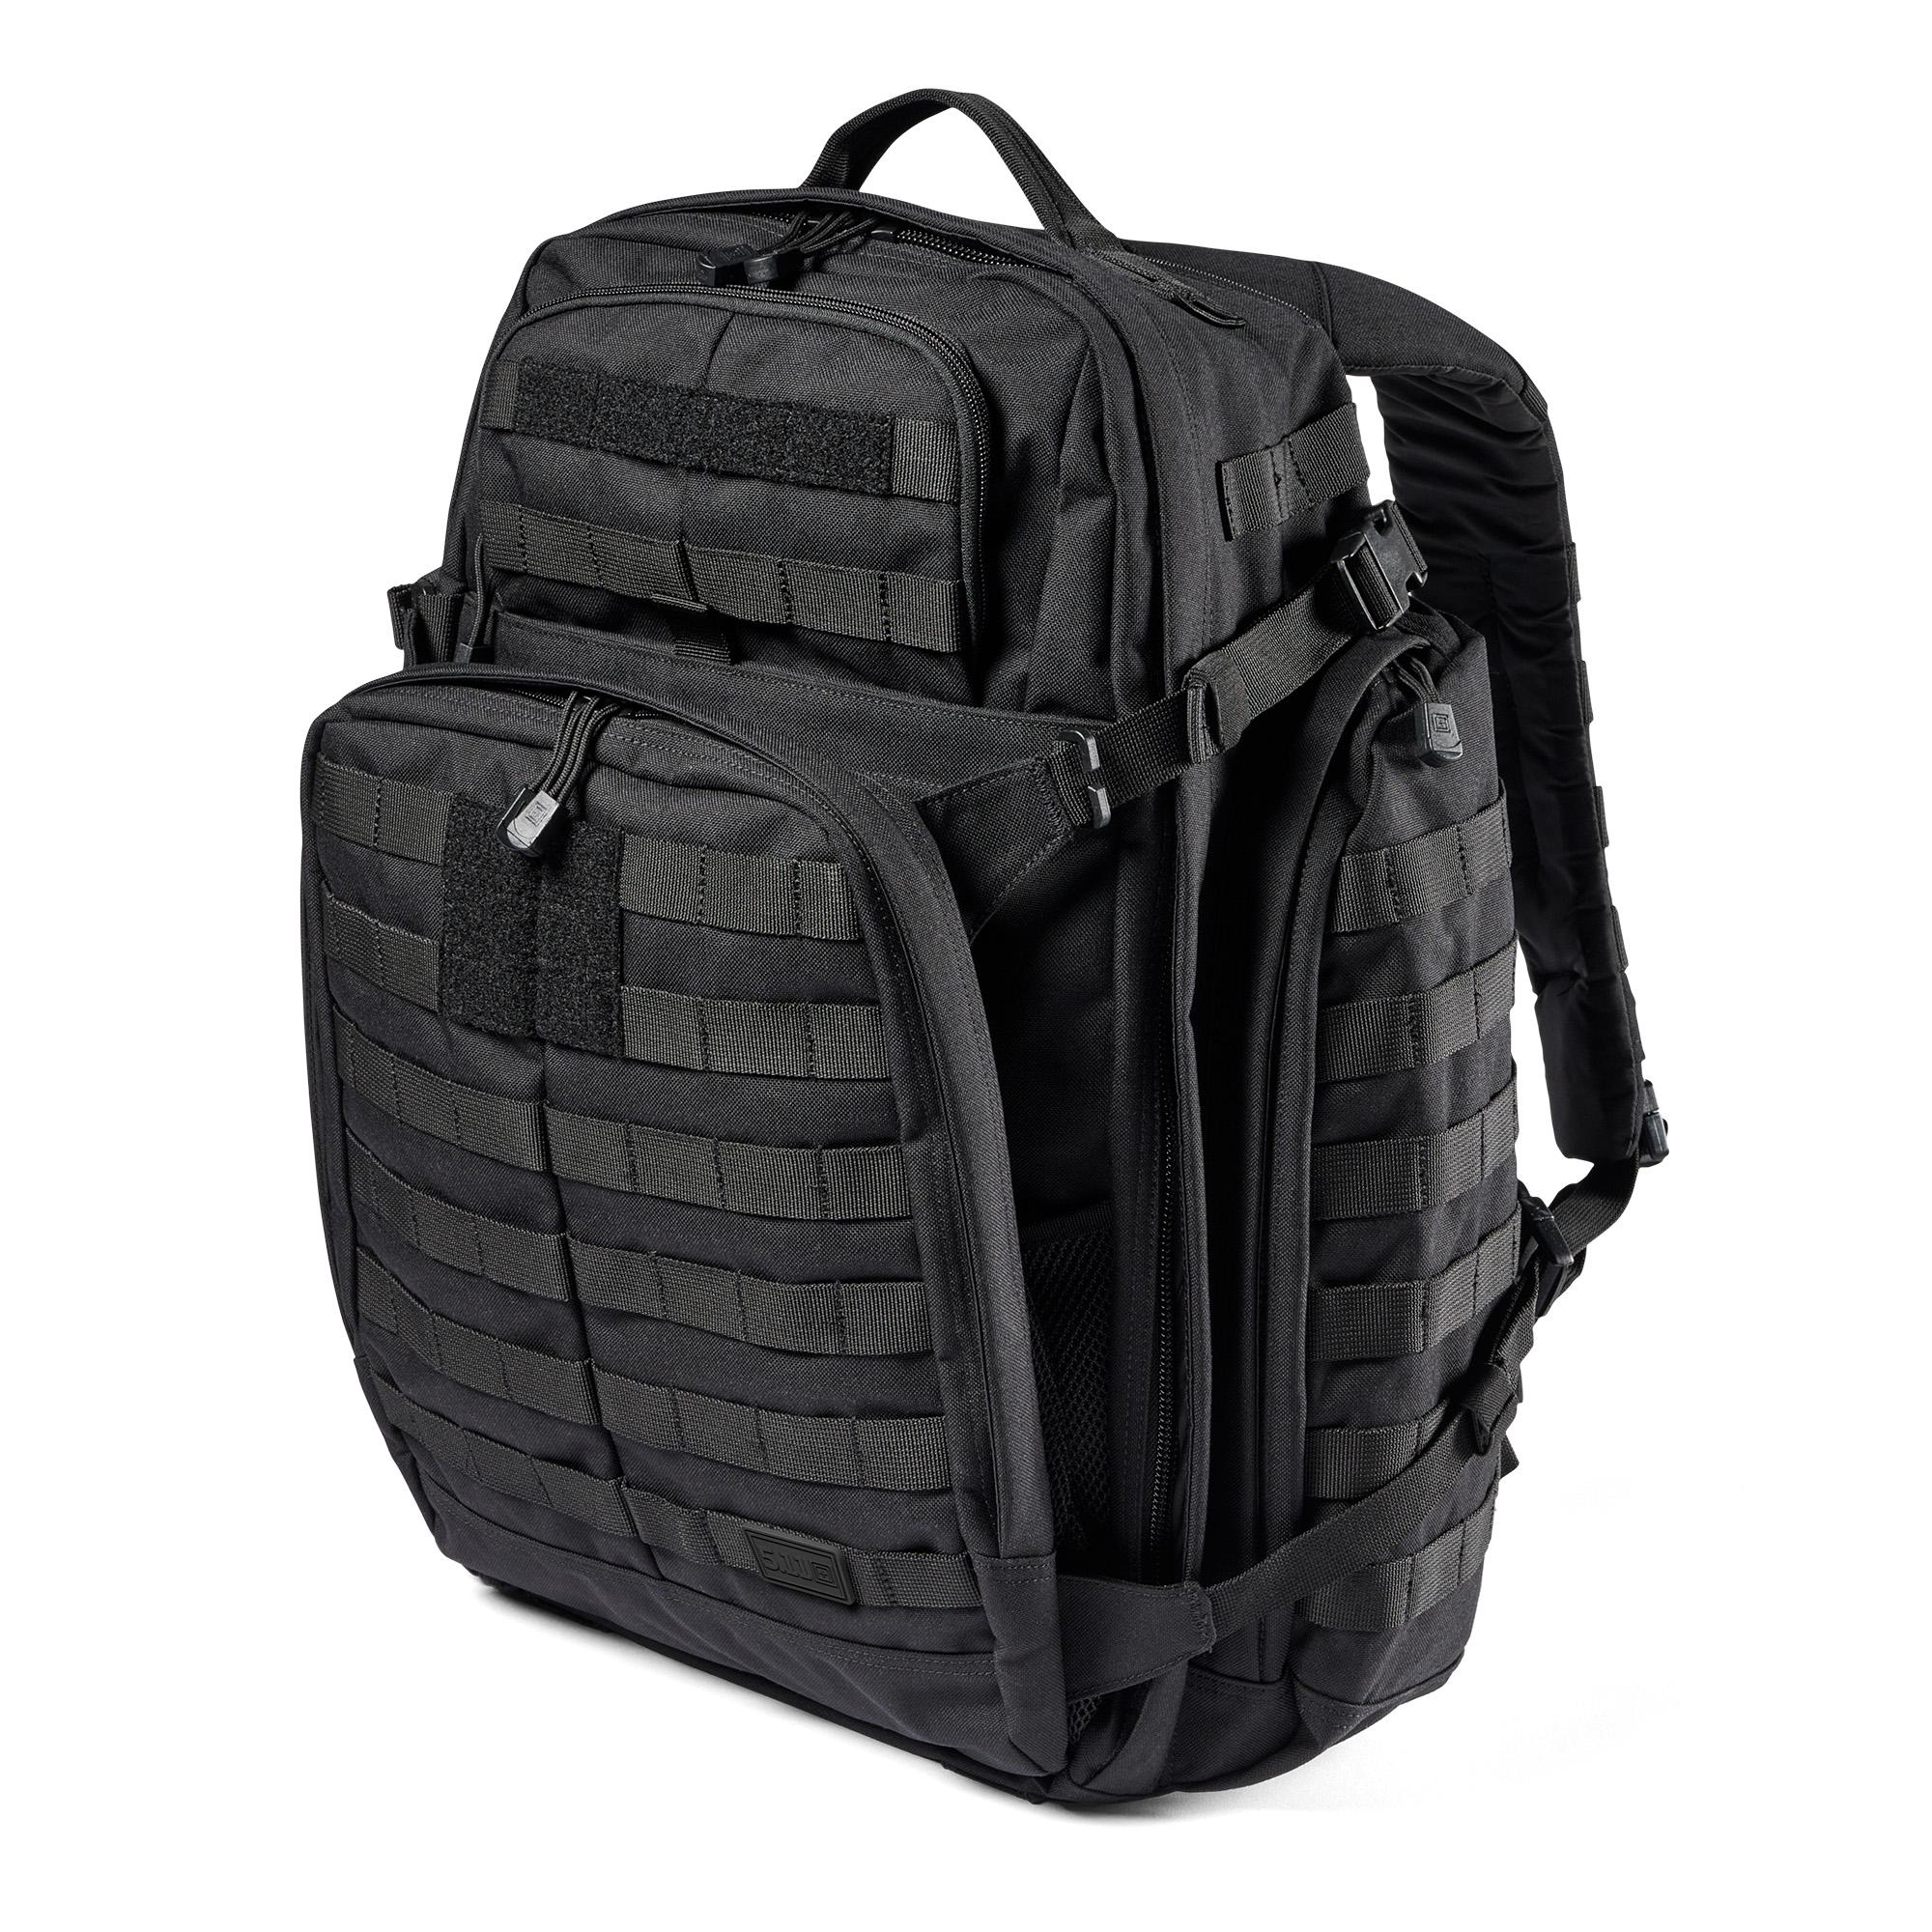 Balo 5.11 Tactical Rush 72 2.0